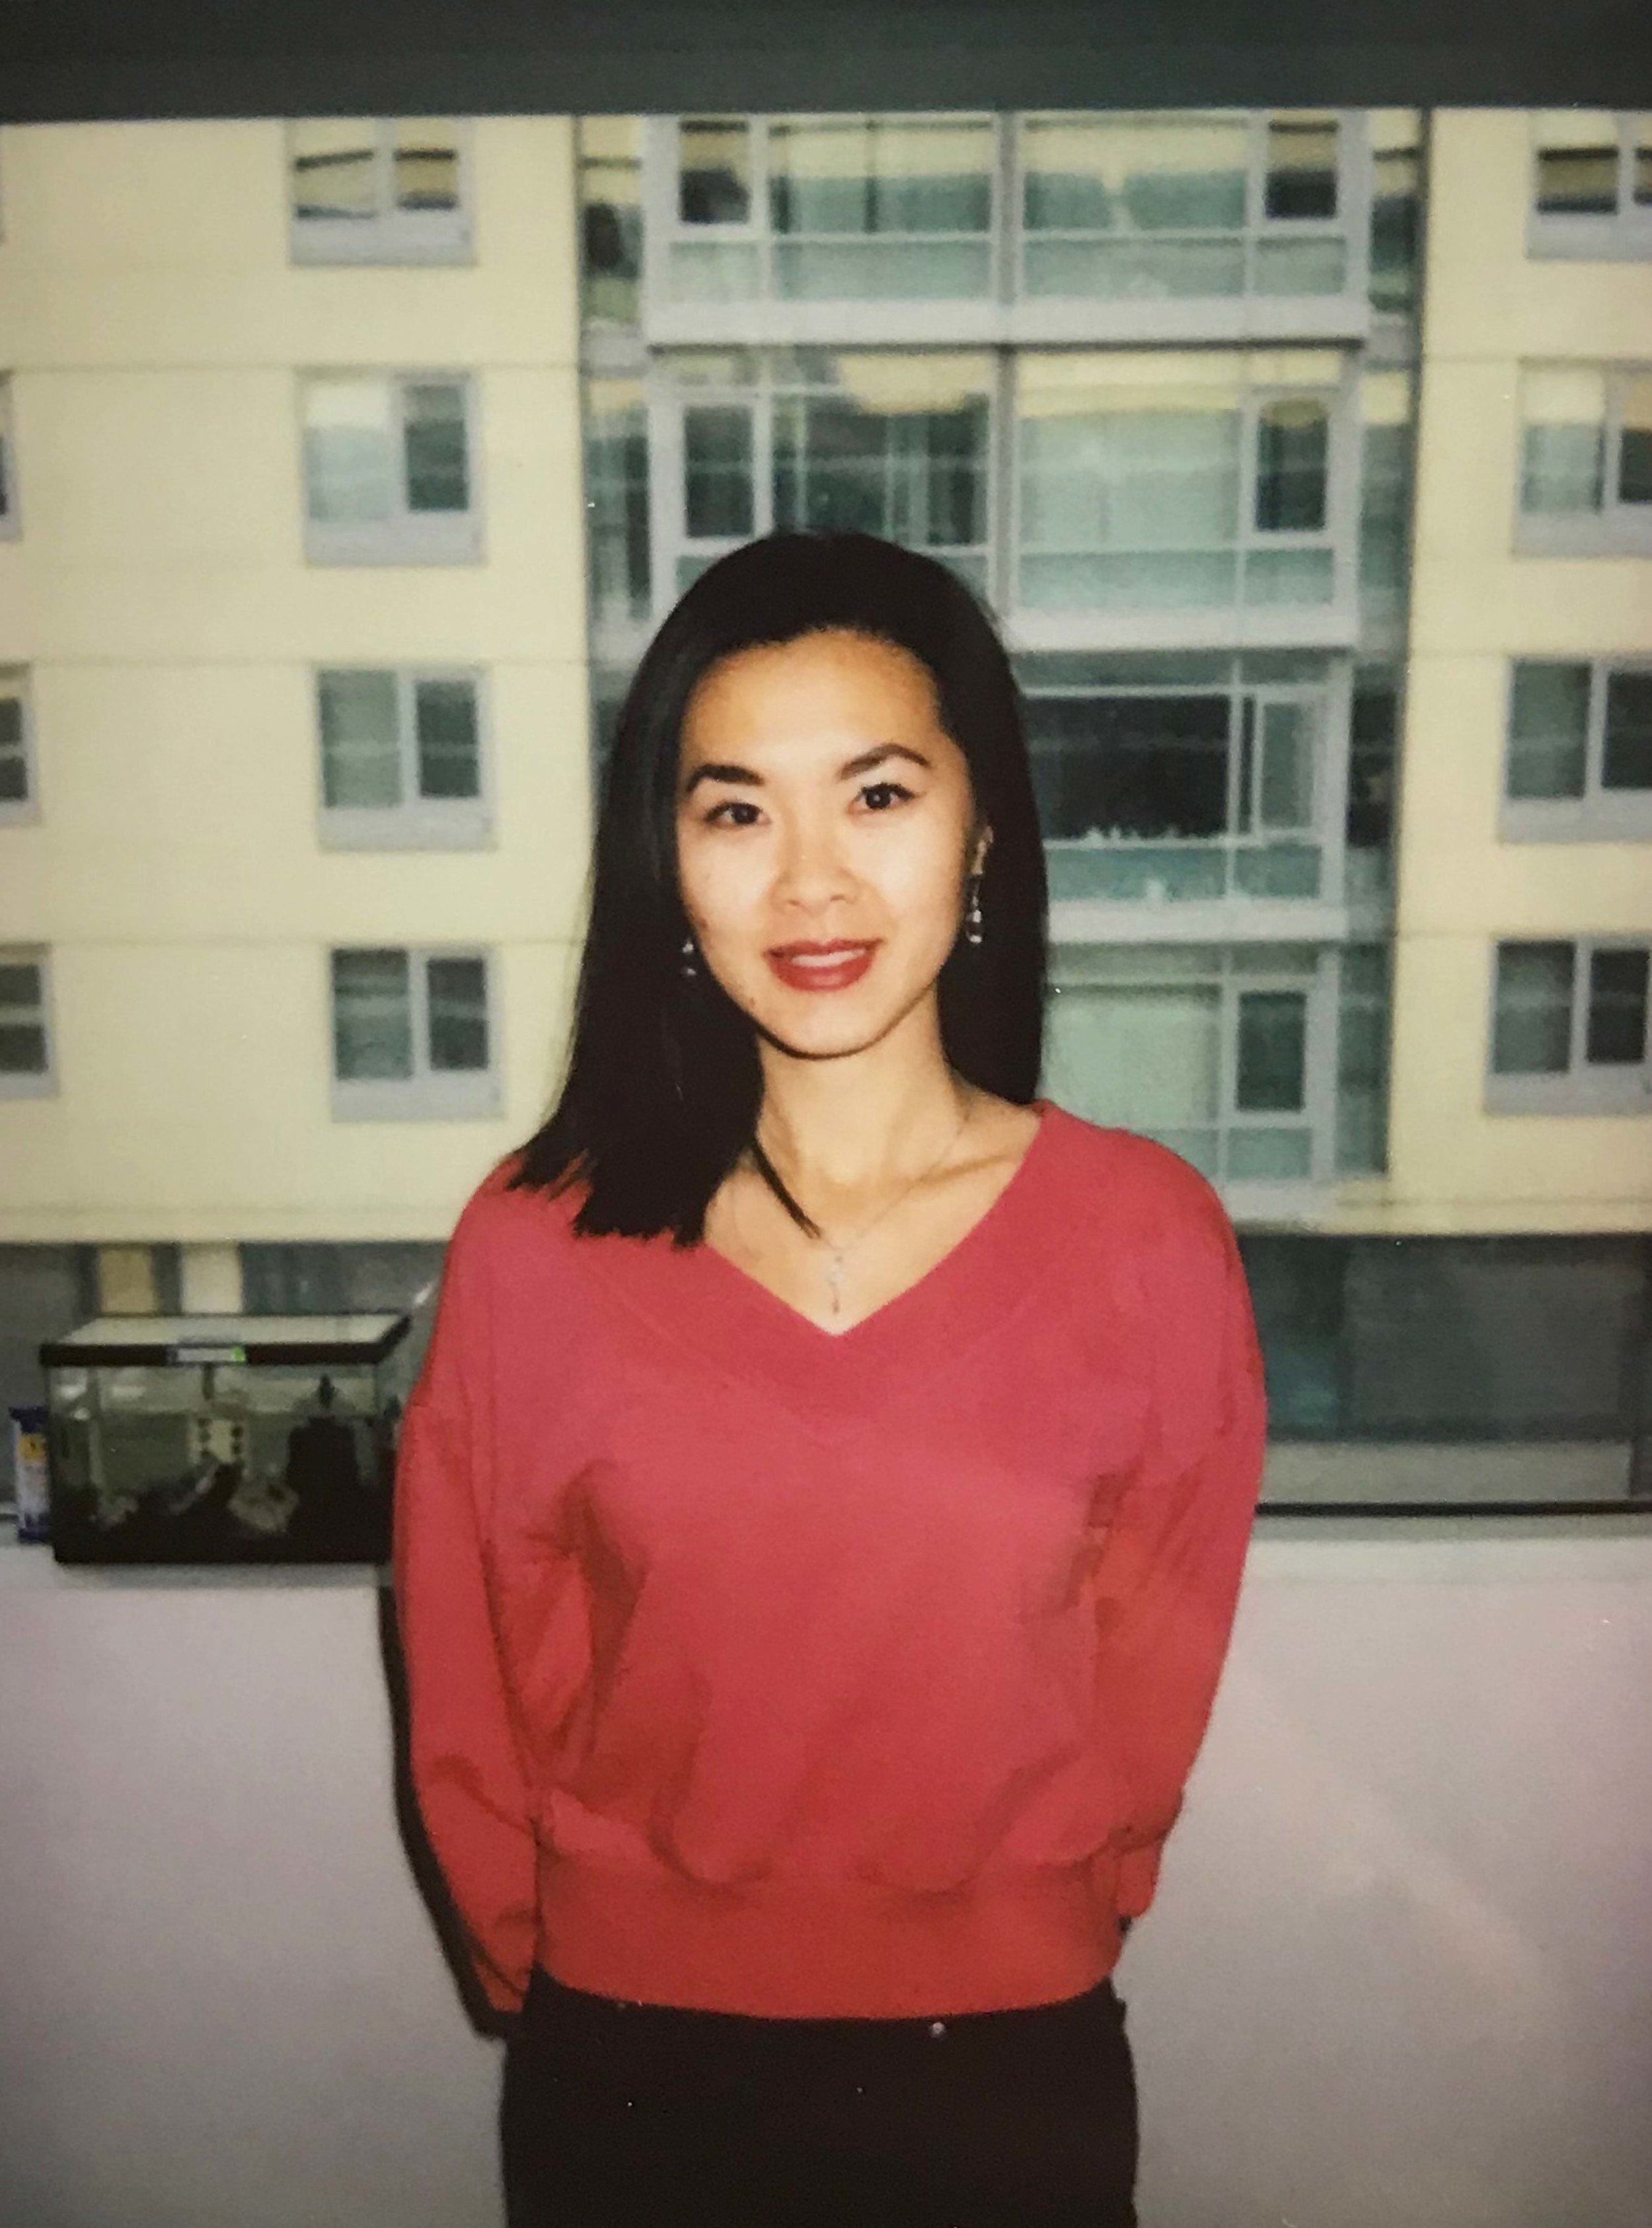 Becky XU Hua Fu - Post-docStanford School of Medicine (Biomedical Informatics, M.S. & Genetics, Ph.D.)Xuhua.fu@ucsf.edu